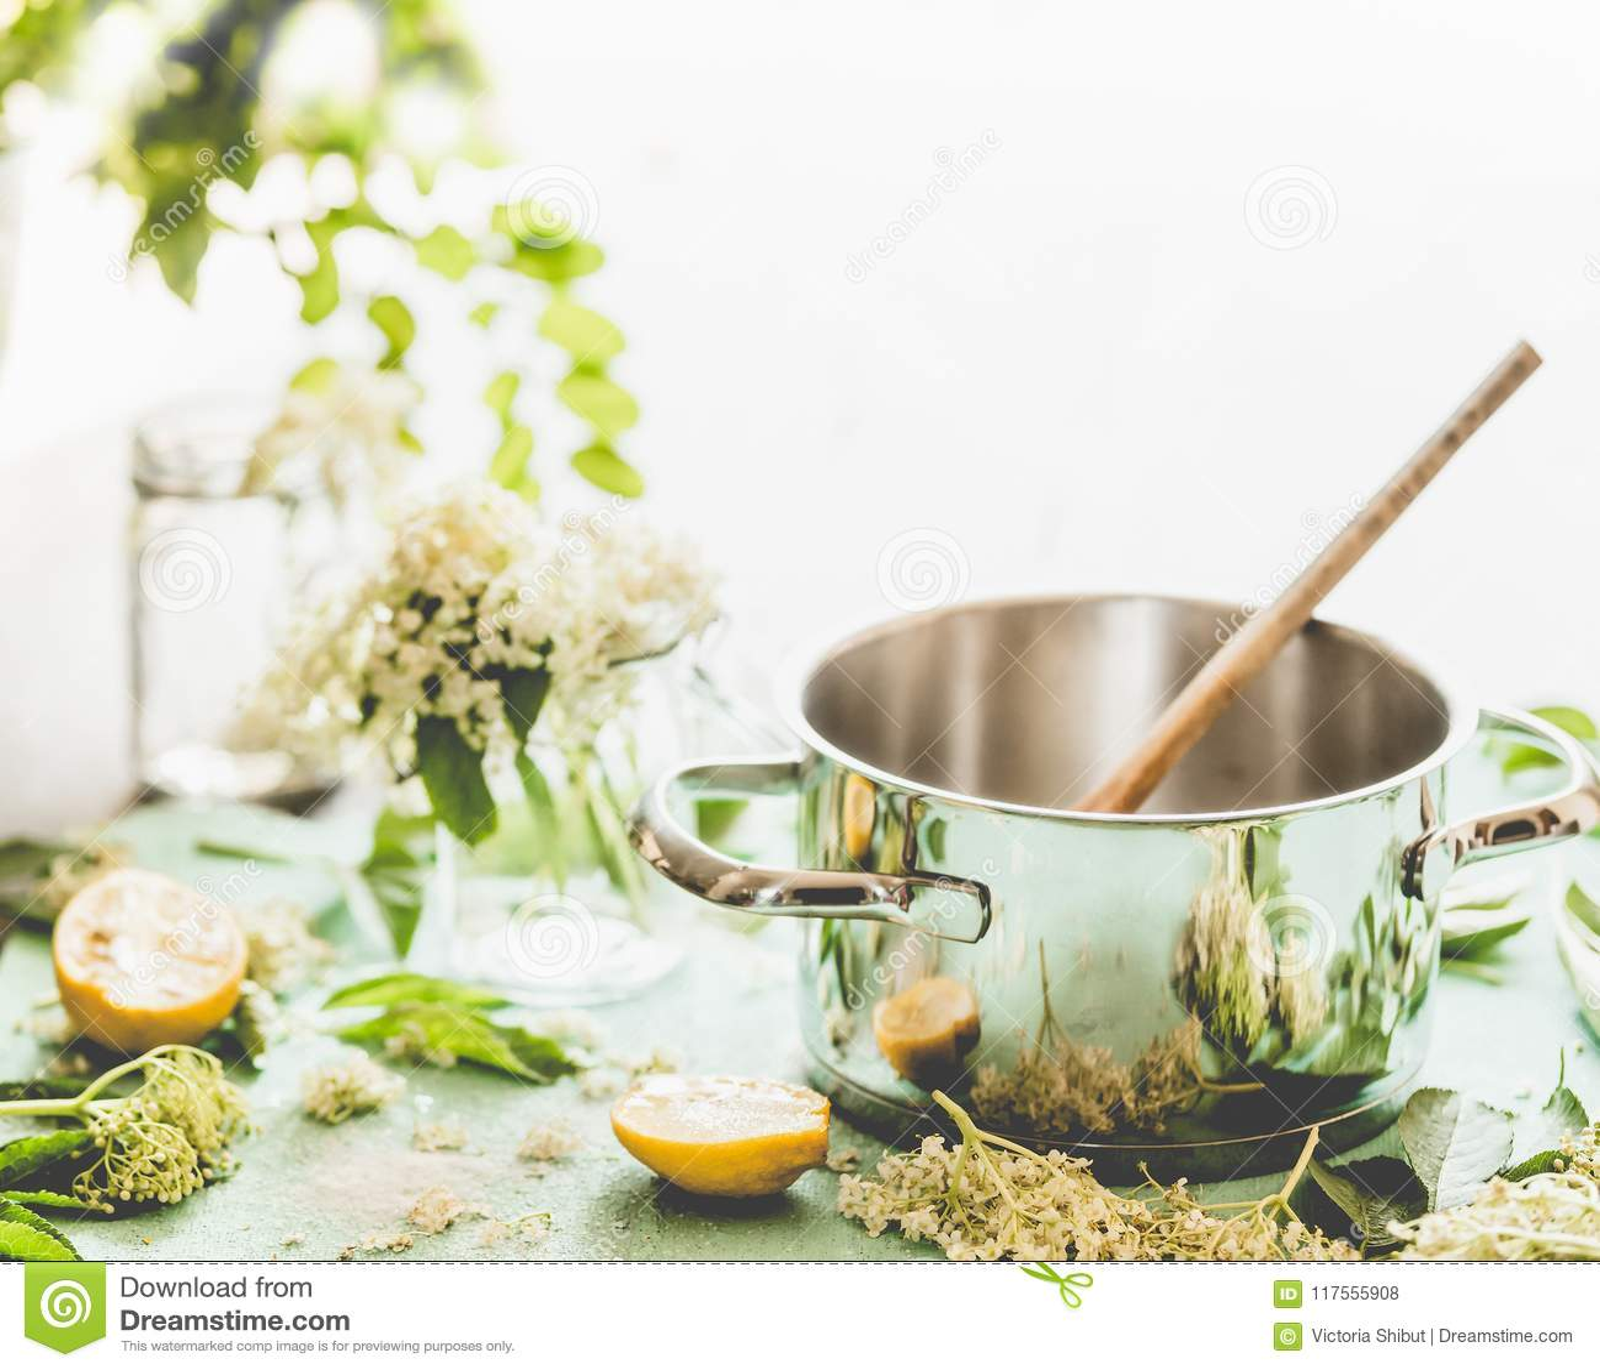 kitchen prep table aide mixer attachments 更旧的花糖浆或果酱准备有匙子 elderflowers和柠檬的罐在厨房用桌上库存 elderflowers和柠檬的罐在窗口的厨房用桌上家庭生活方式烹调健康季节性的食物吃和